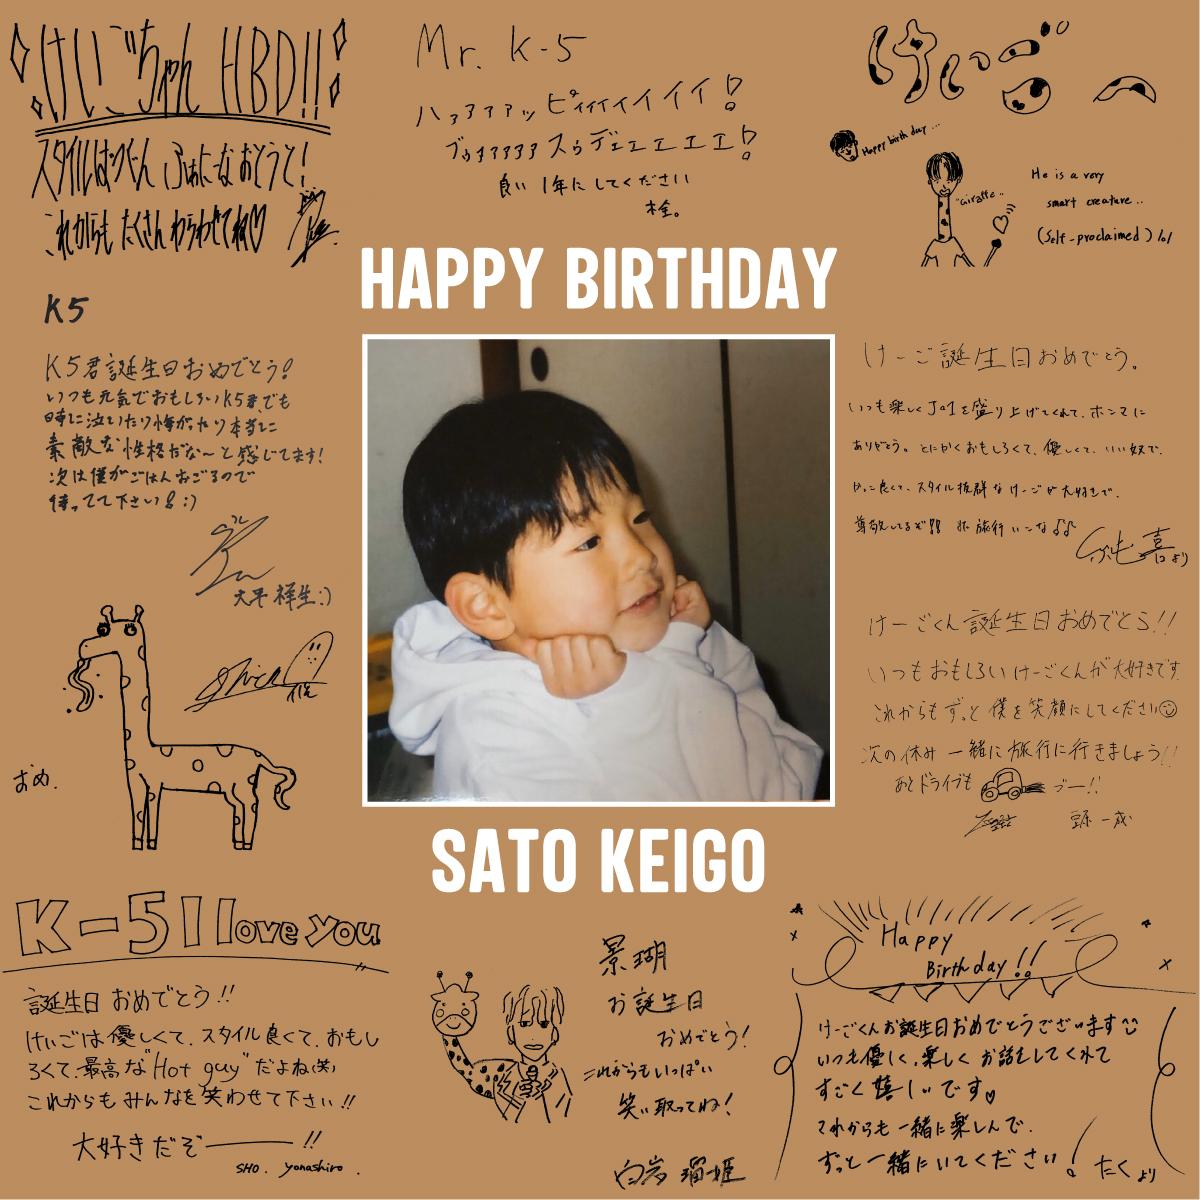 @official_jo1's photo on #HappyKeigoDay